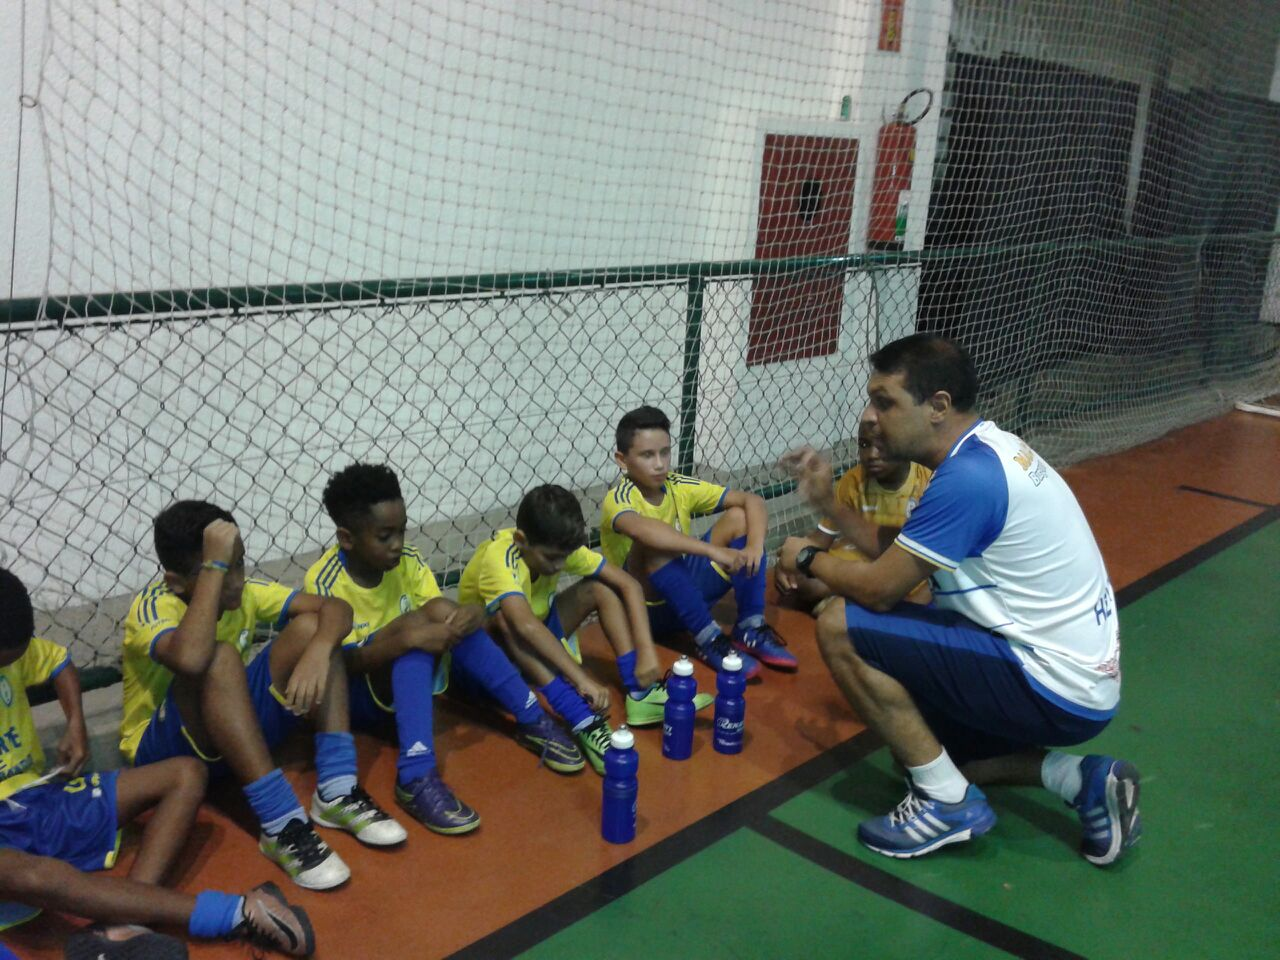 Copa Prefeitura Bahamas de Futsal  resultados dos Boletins 3 e 4 ... bd36c0ae73520